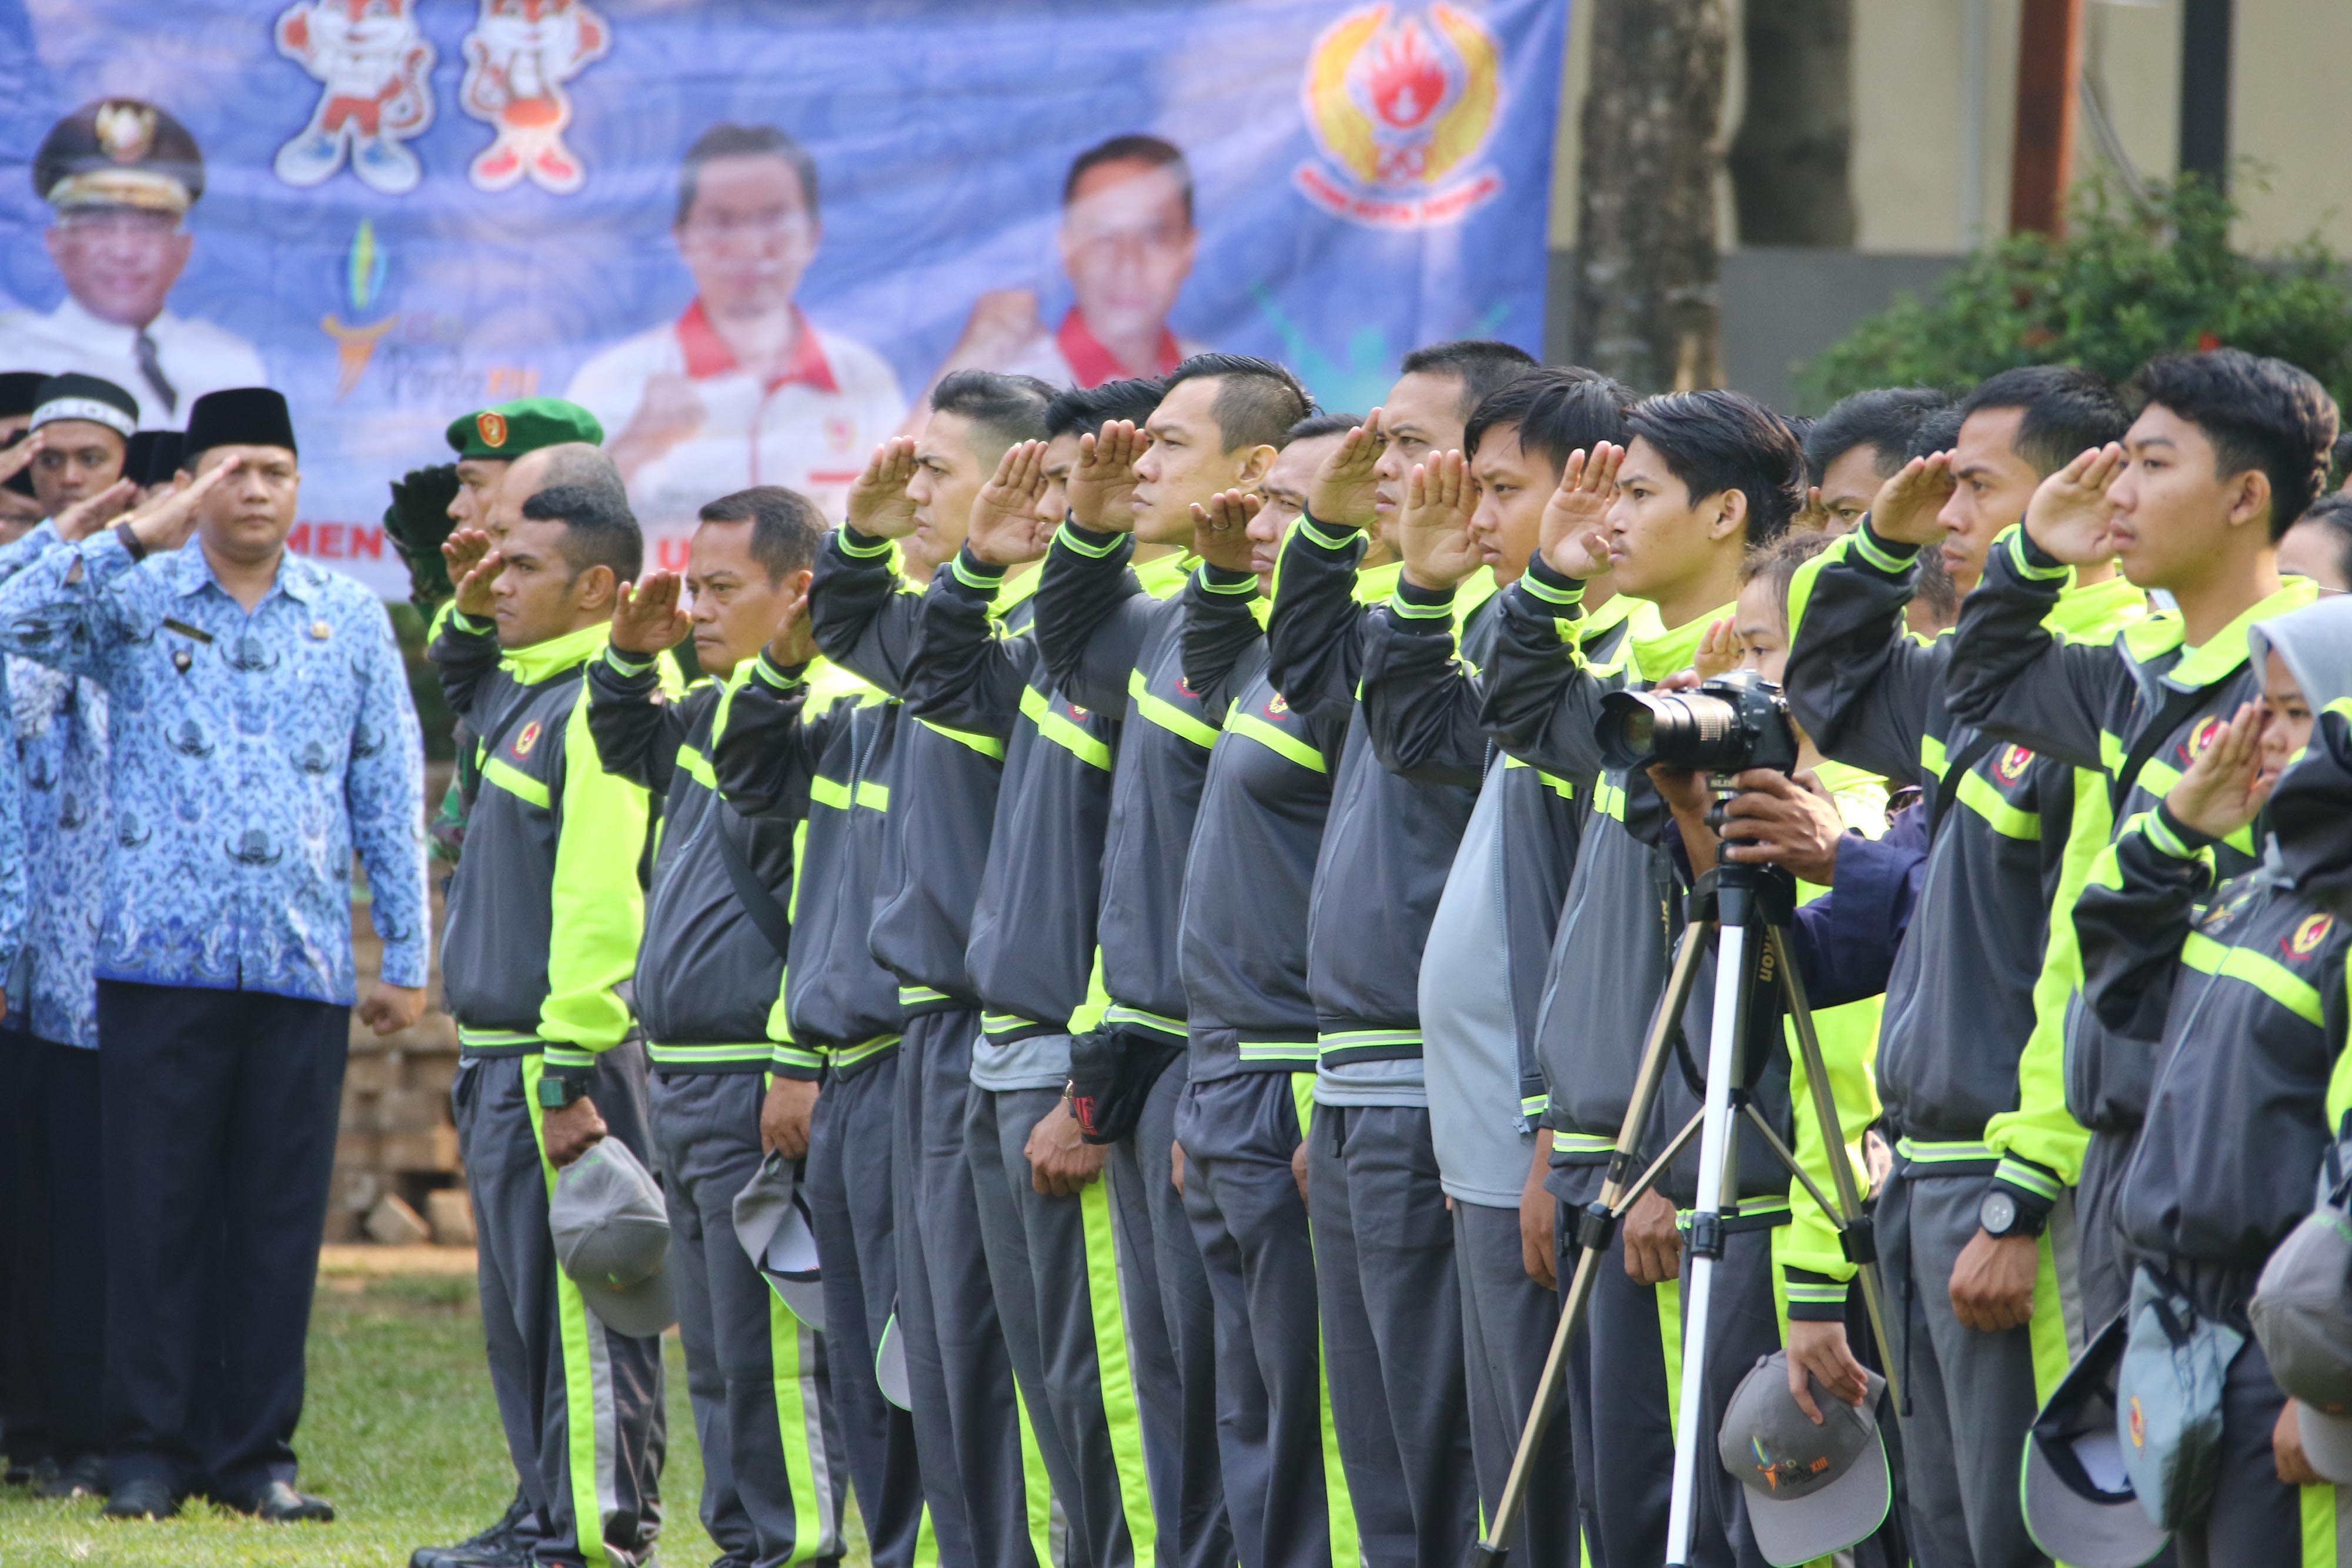 Atlet Kota Depok memberi hormat pada upacara pelepasan Kontingen Kota Depok untuk PORDA Jabar XIII-2018 di balaikota Depok, Senin (1/10) pagi. KONI KOTA DEPOK/Faruqi/2018